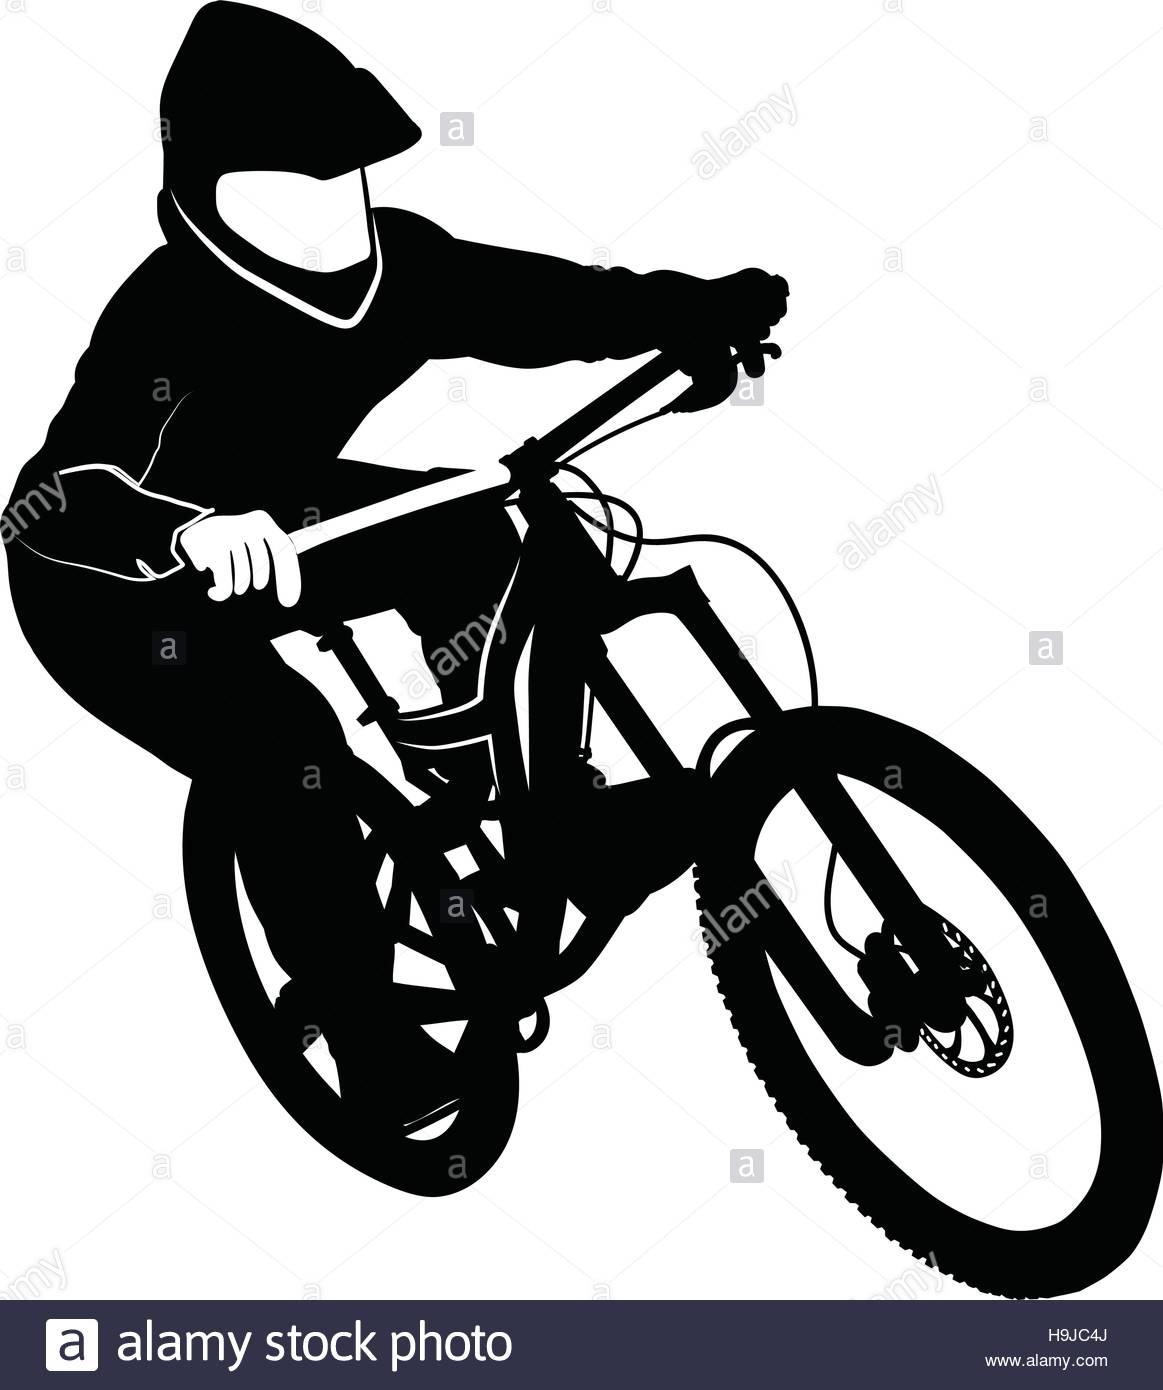 1163x1390 Bike Race On A Mountain Slope